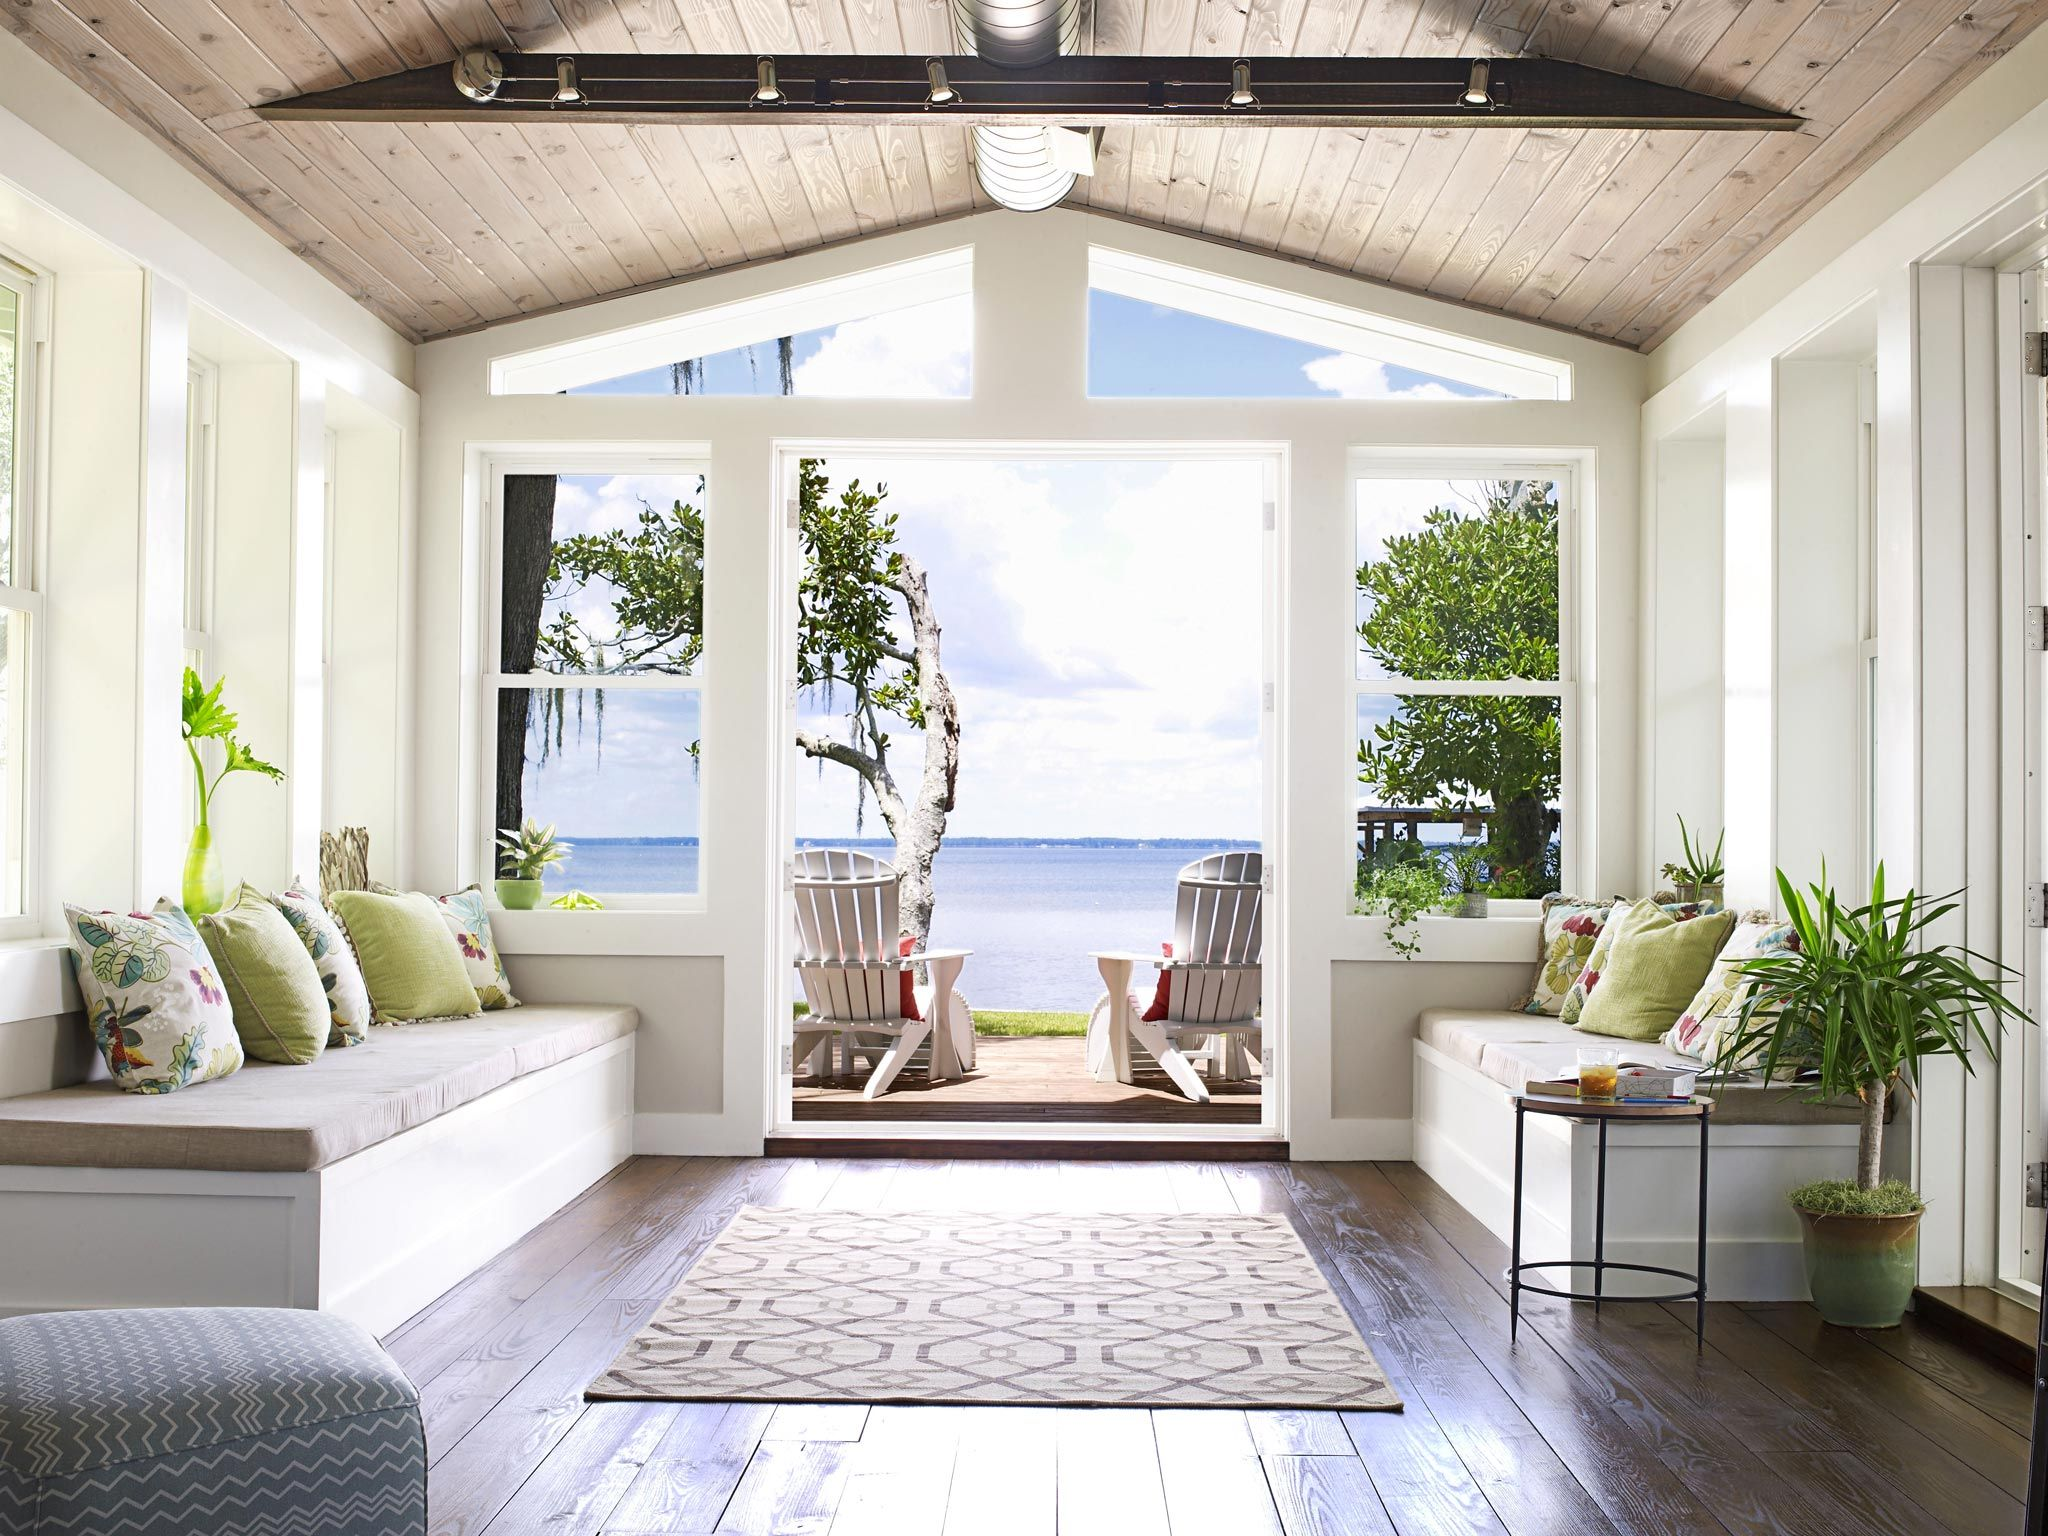 Decorating A Beach House Follow David Bromstads Design Rules